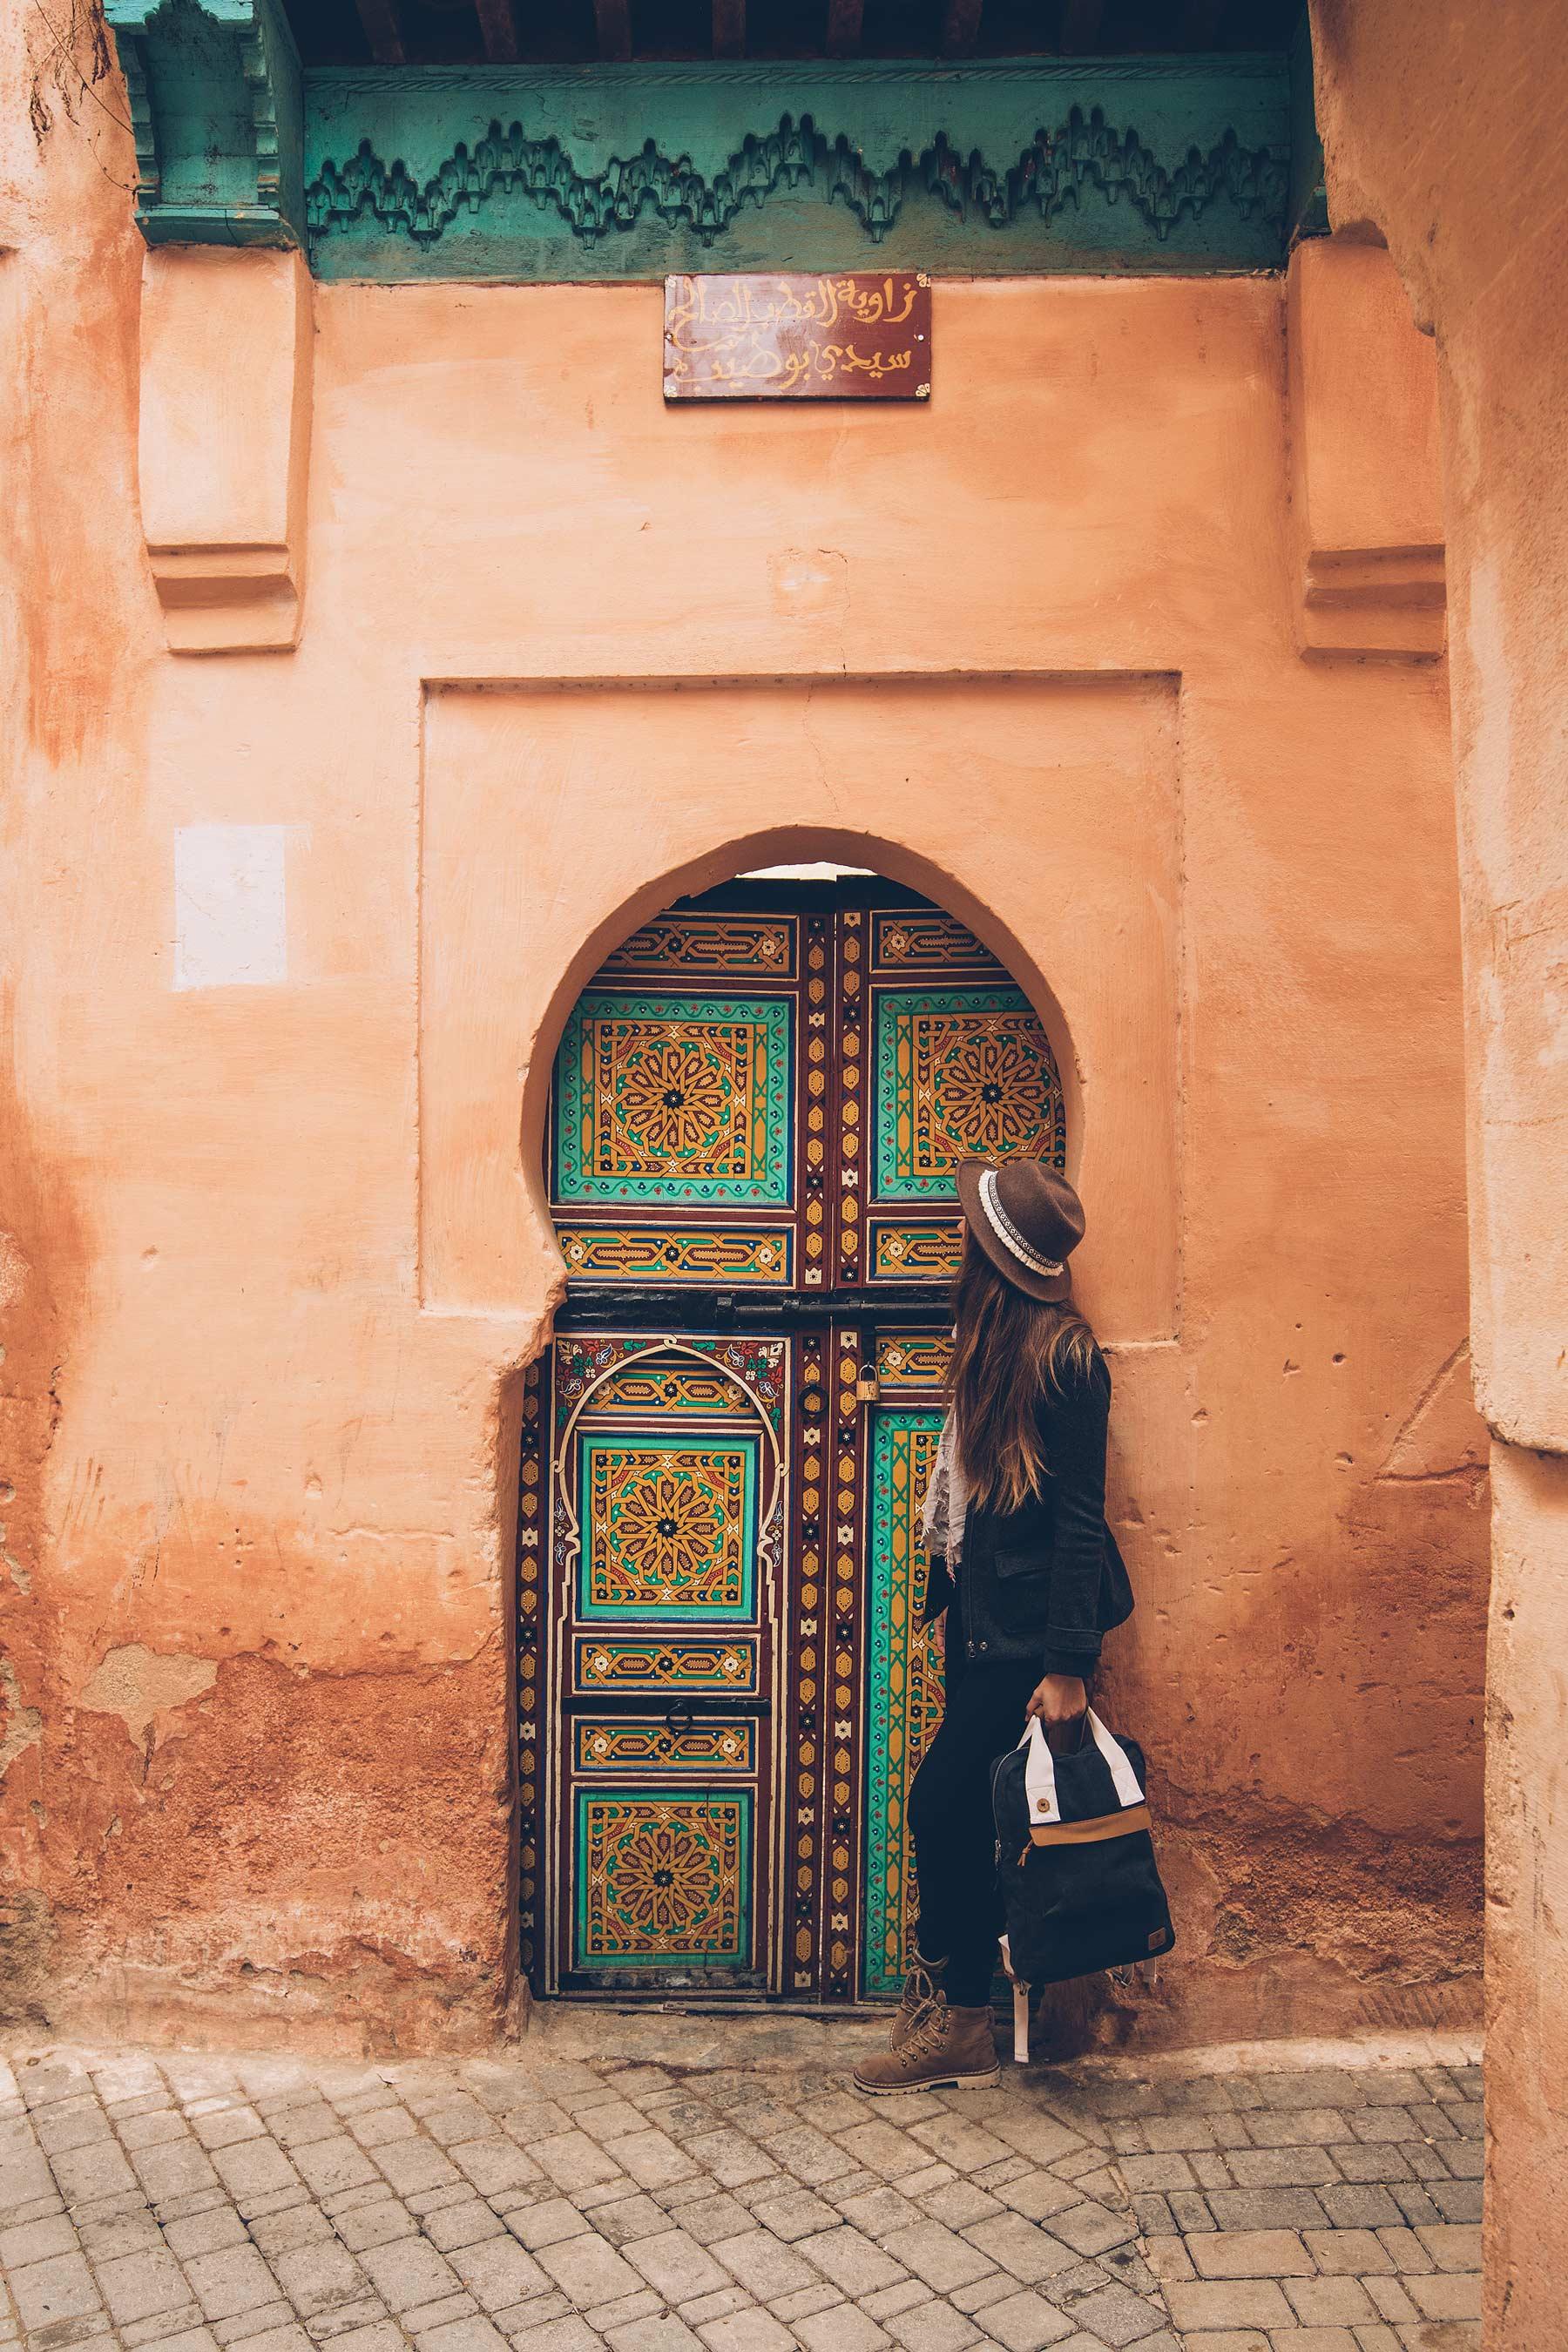 Maroc, Week-end à Fès et Meknès